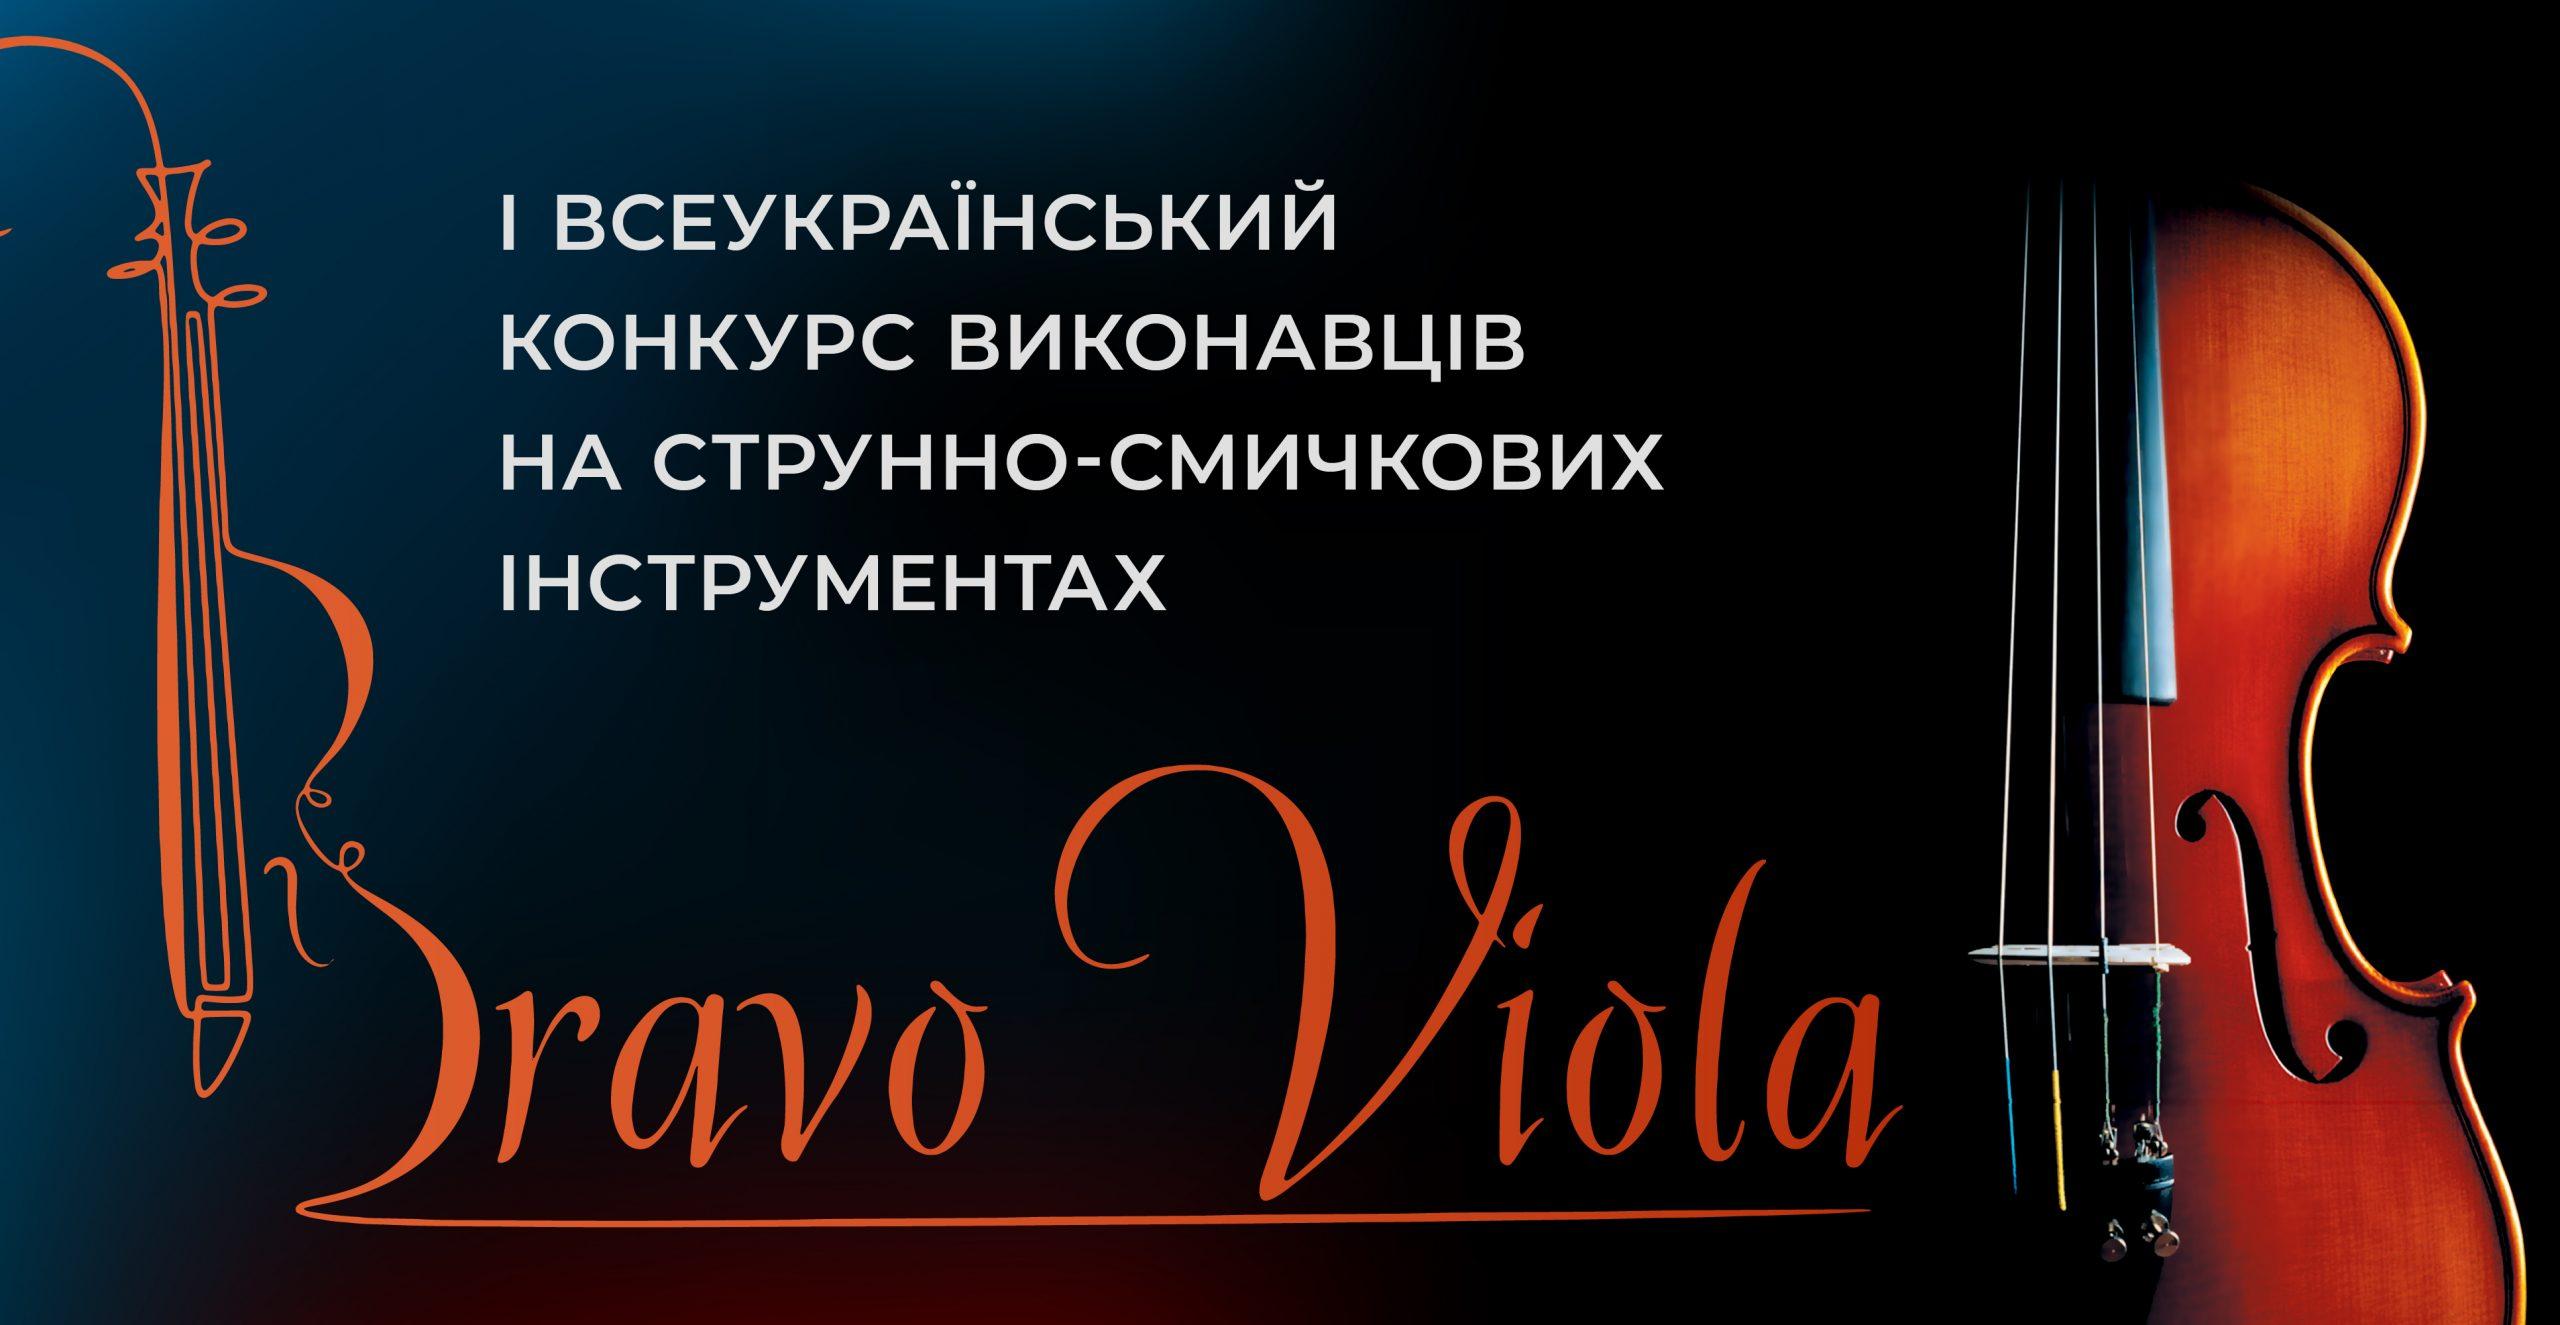 У Черкасах нагородили переможців Всеукраїнського музичного конкурсу